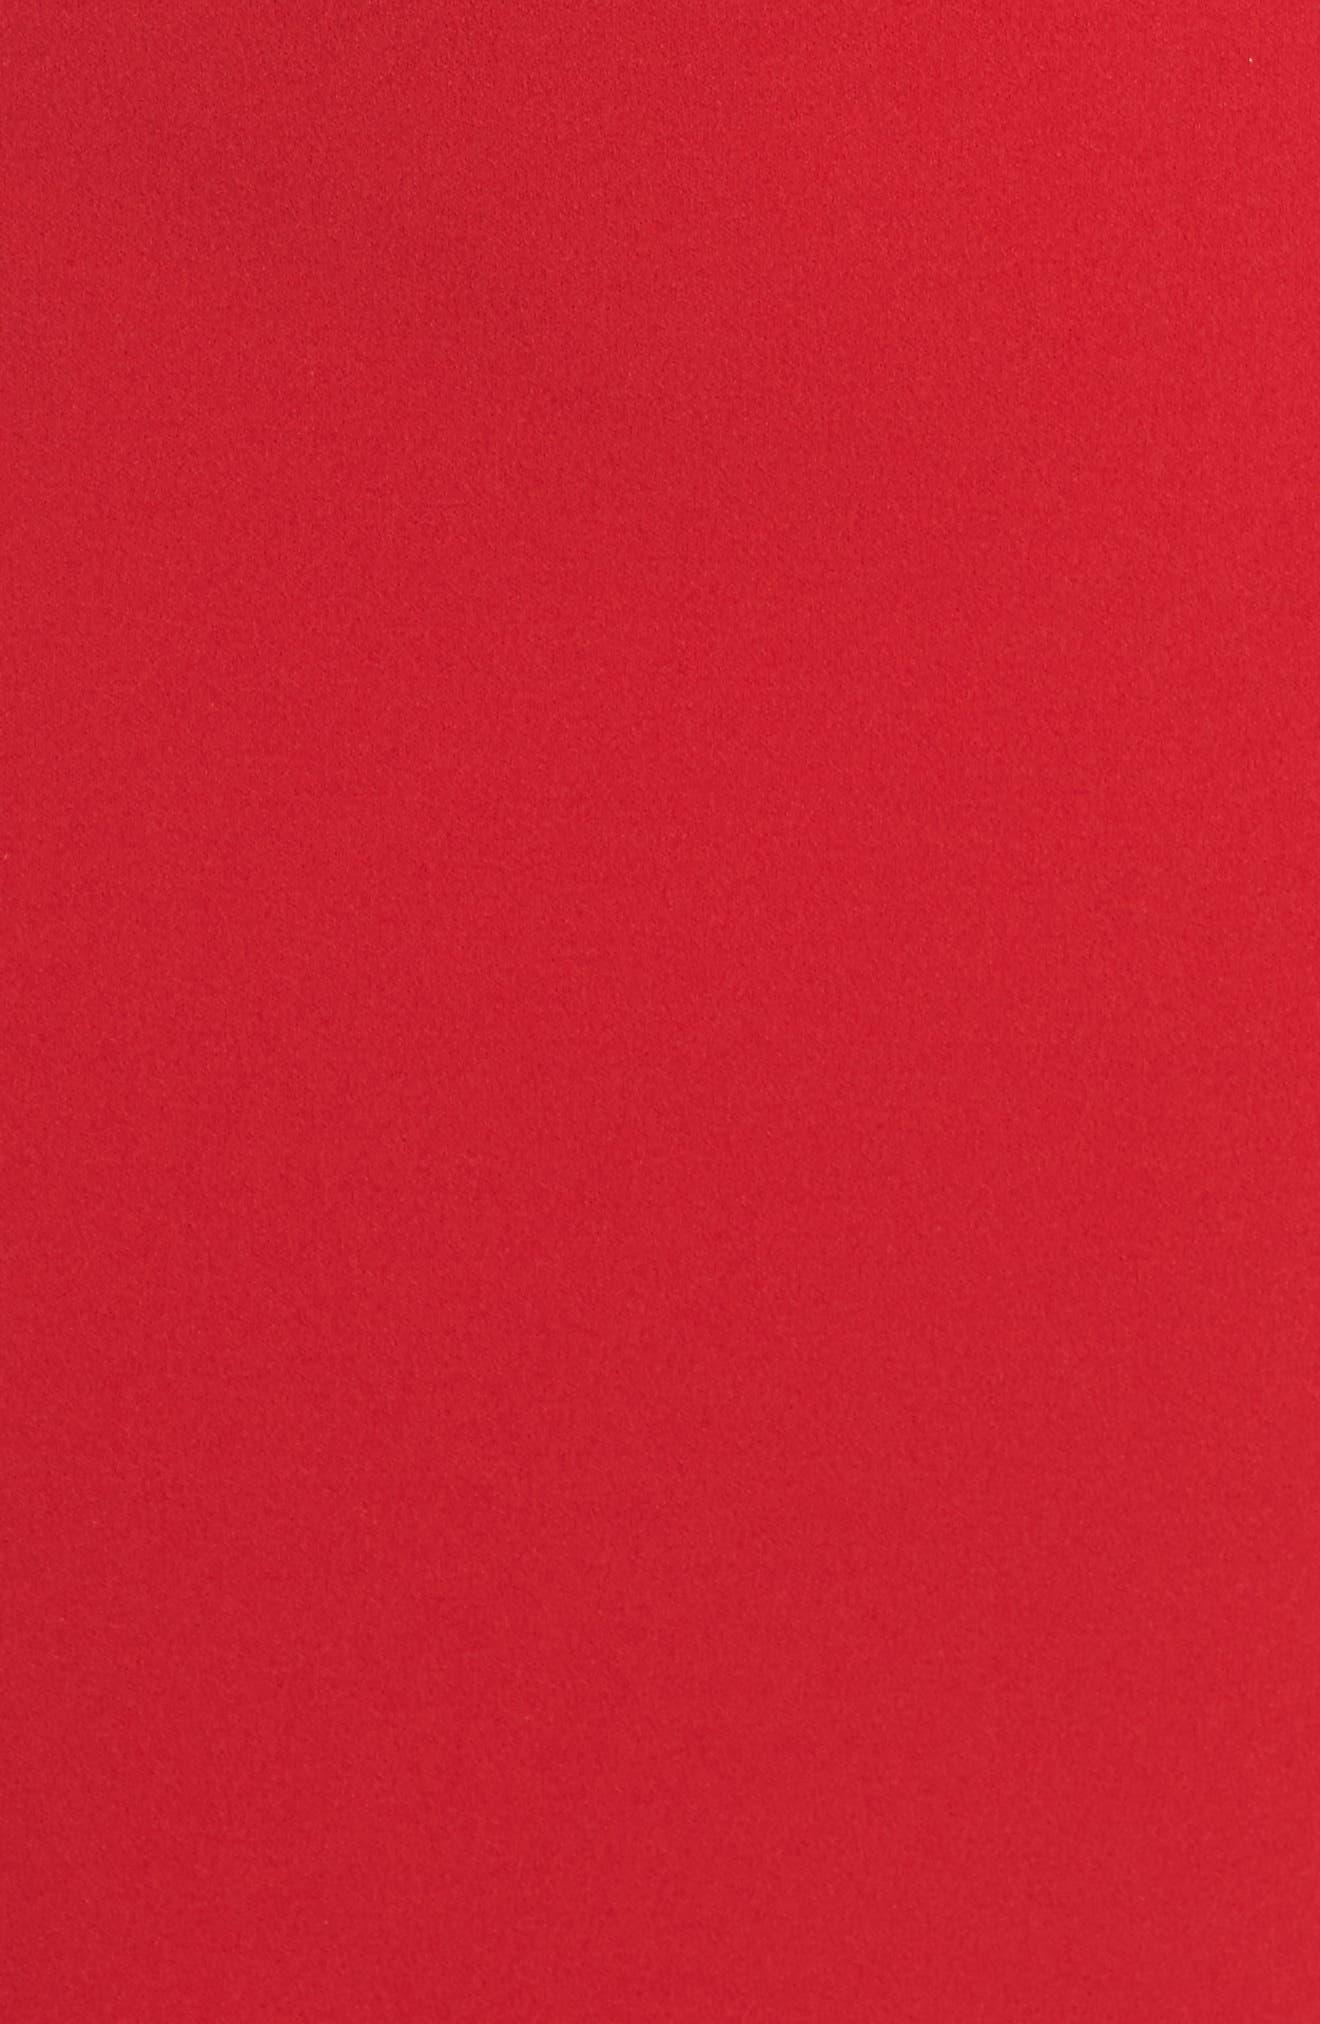 Knotted Scuba Sheath Dress,                             Alternate thumbnail 6, color,                             600